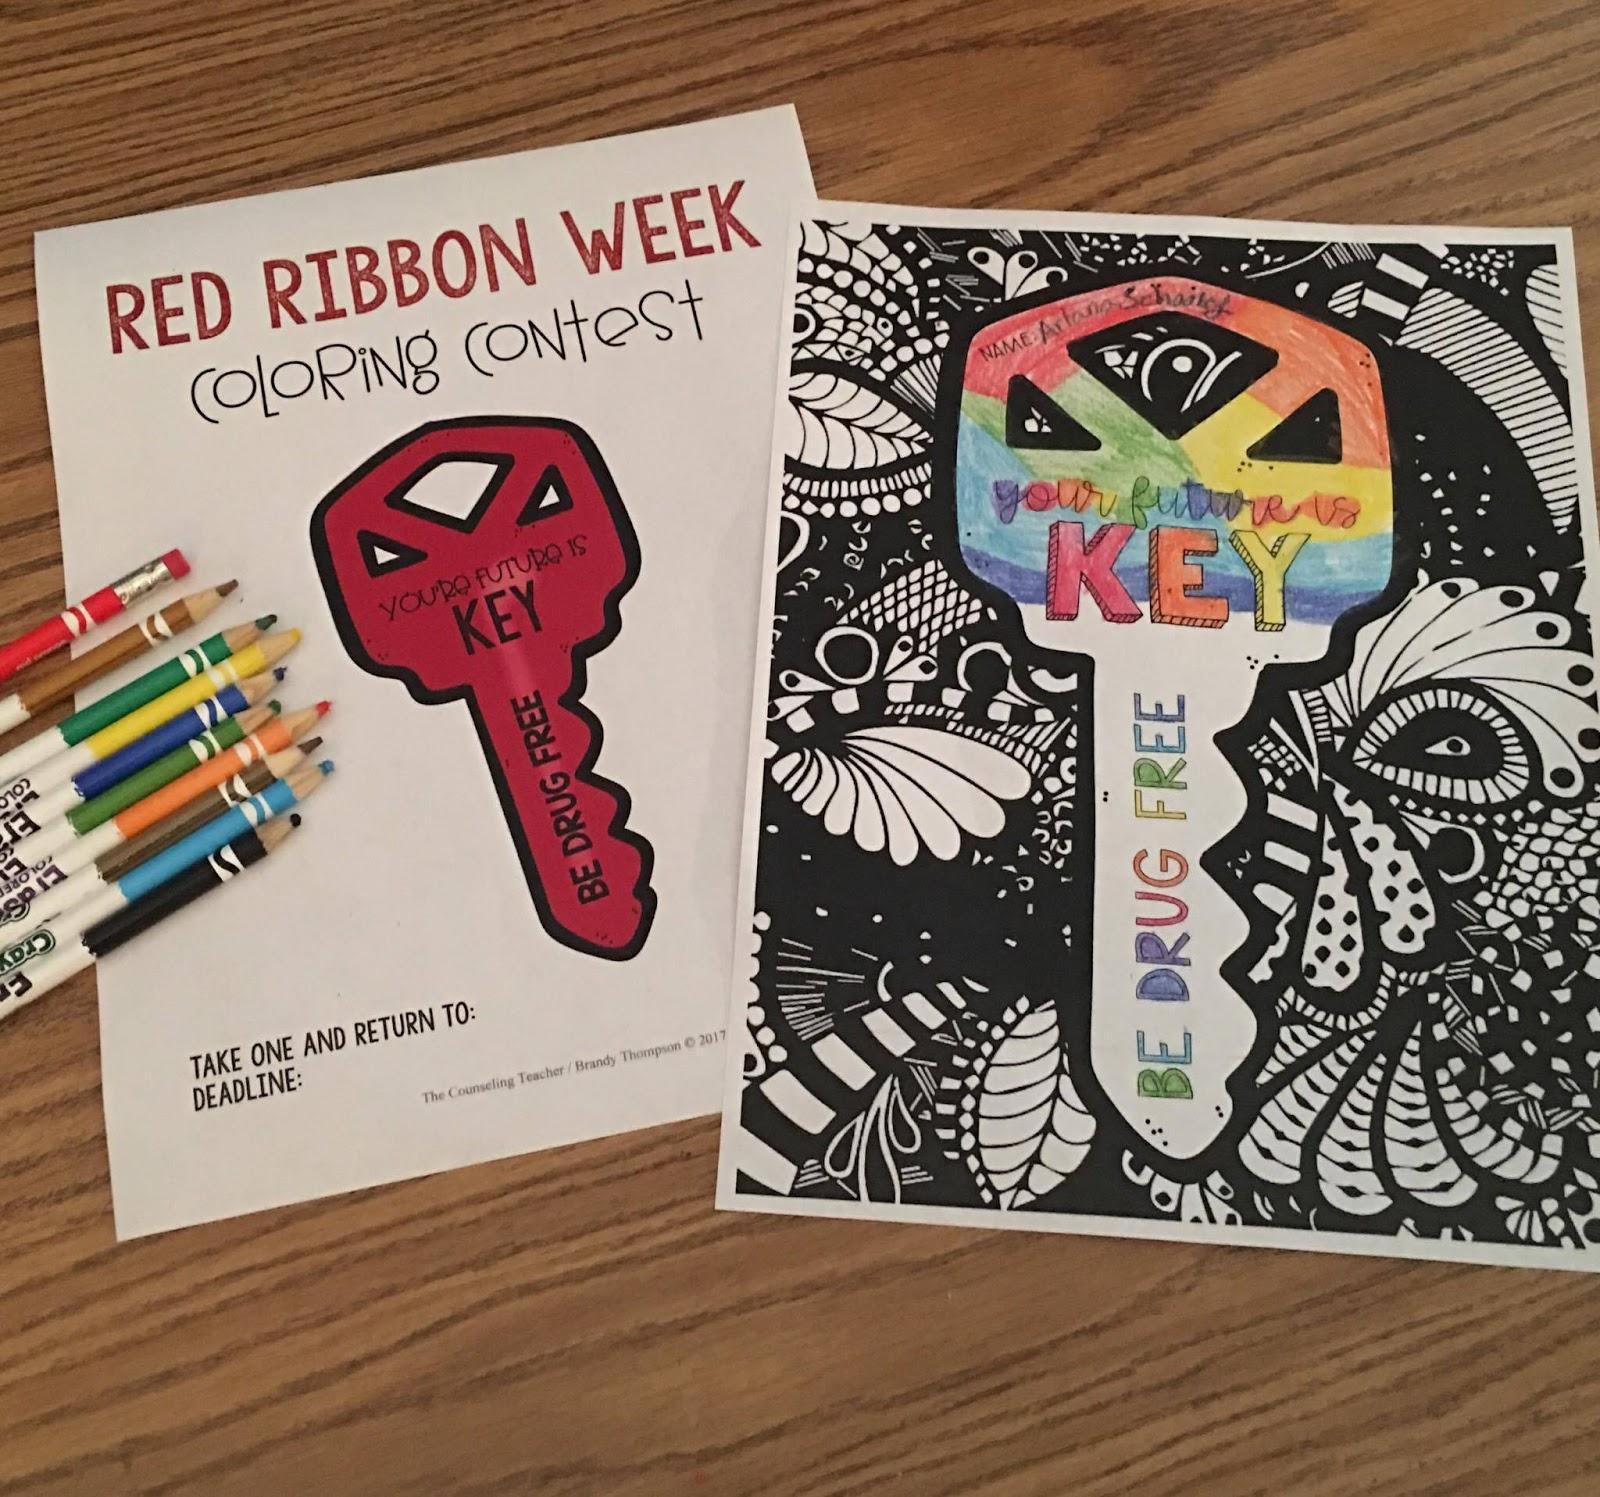 Red Ribbon Week Activities Free Printable Coloring